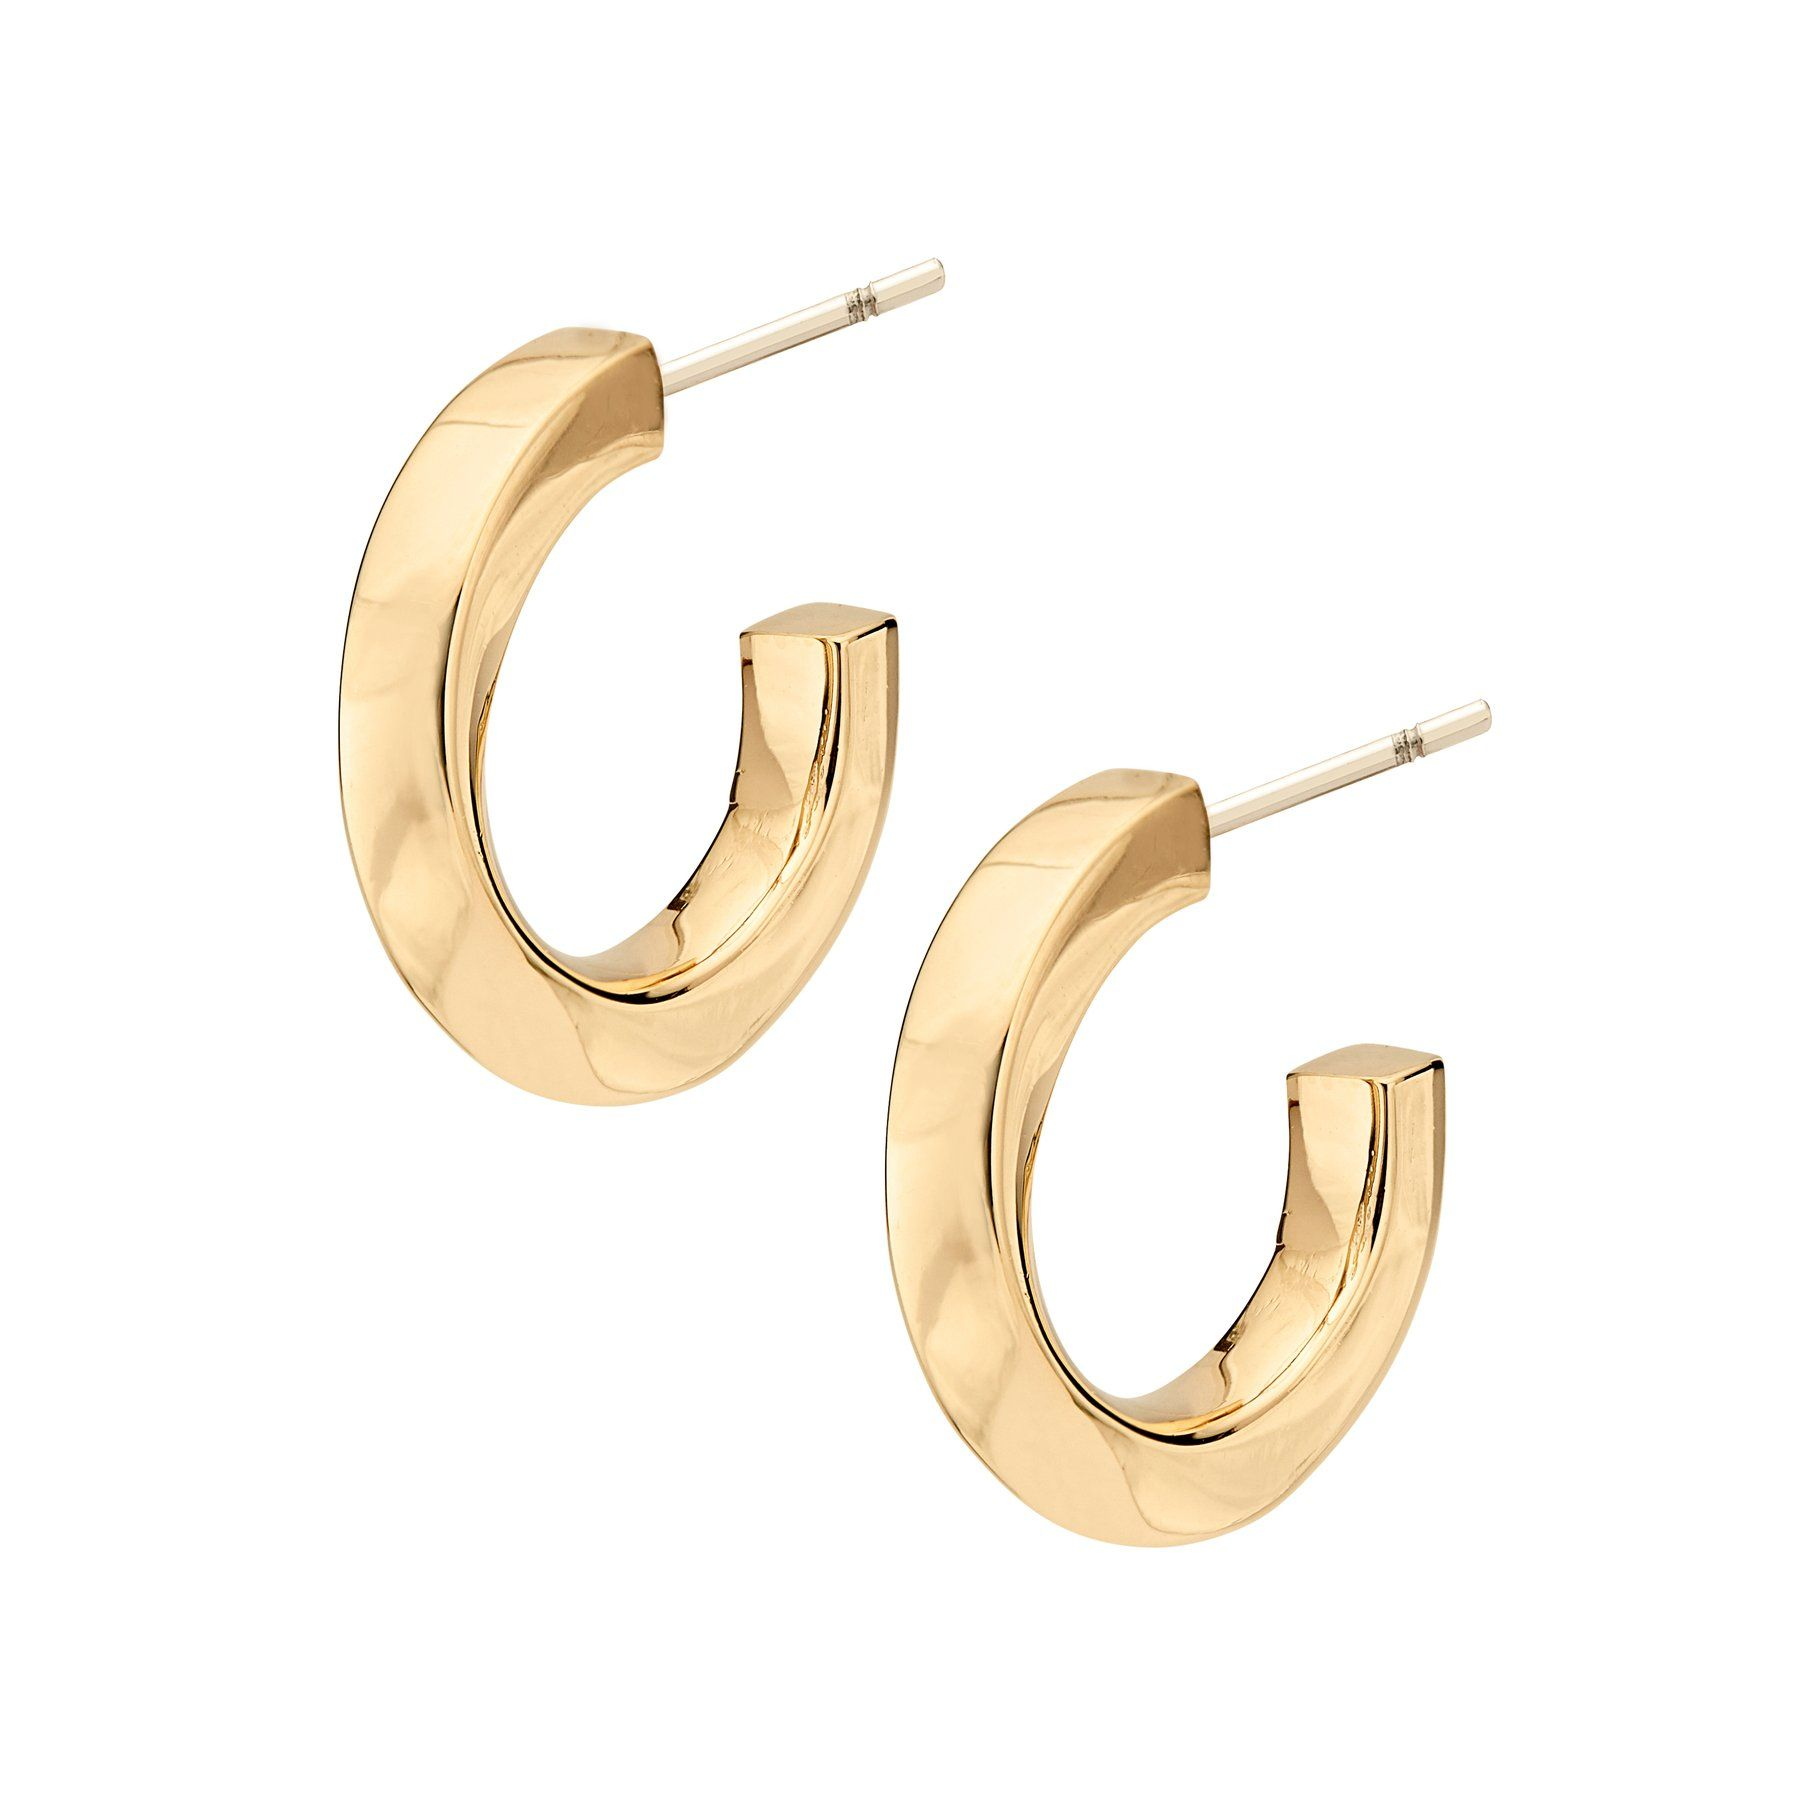 Product Image for Imara Mini Hoop Earrings